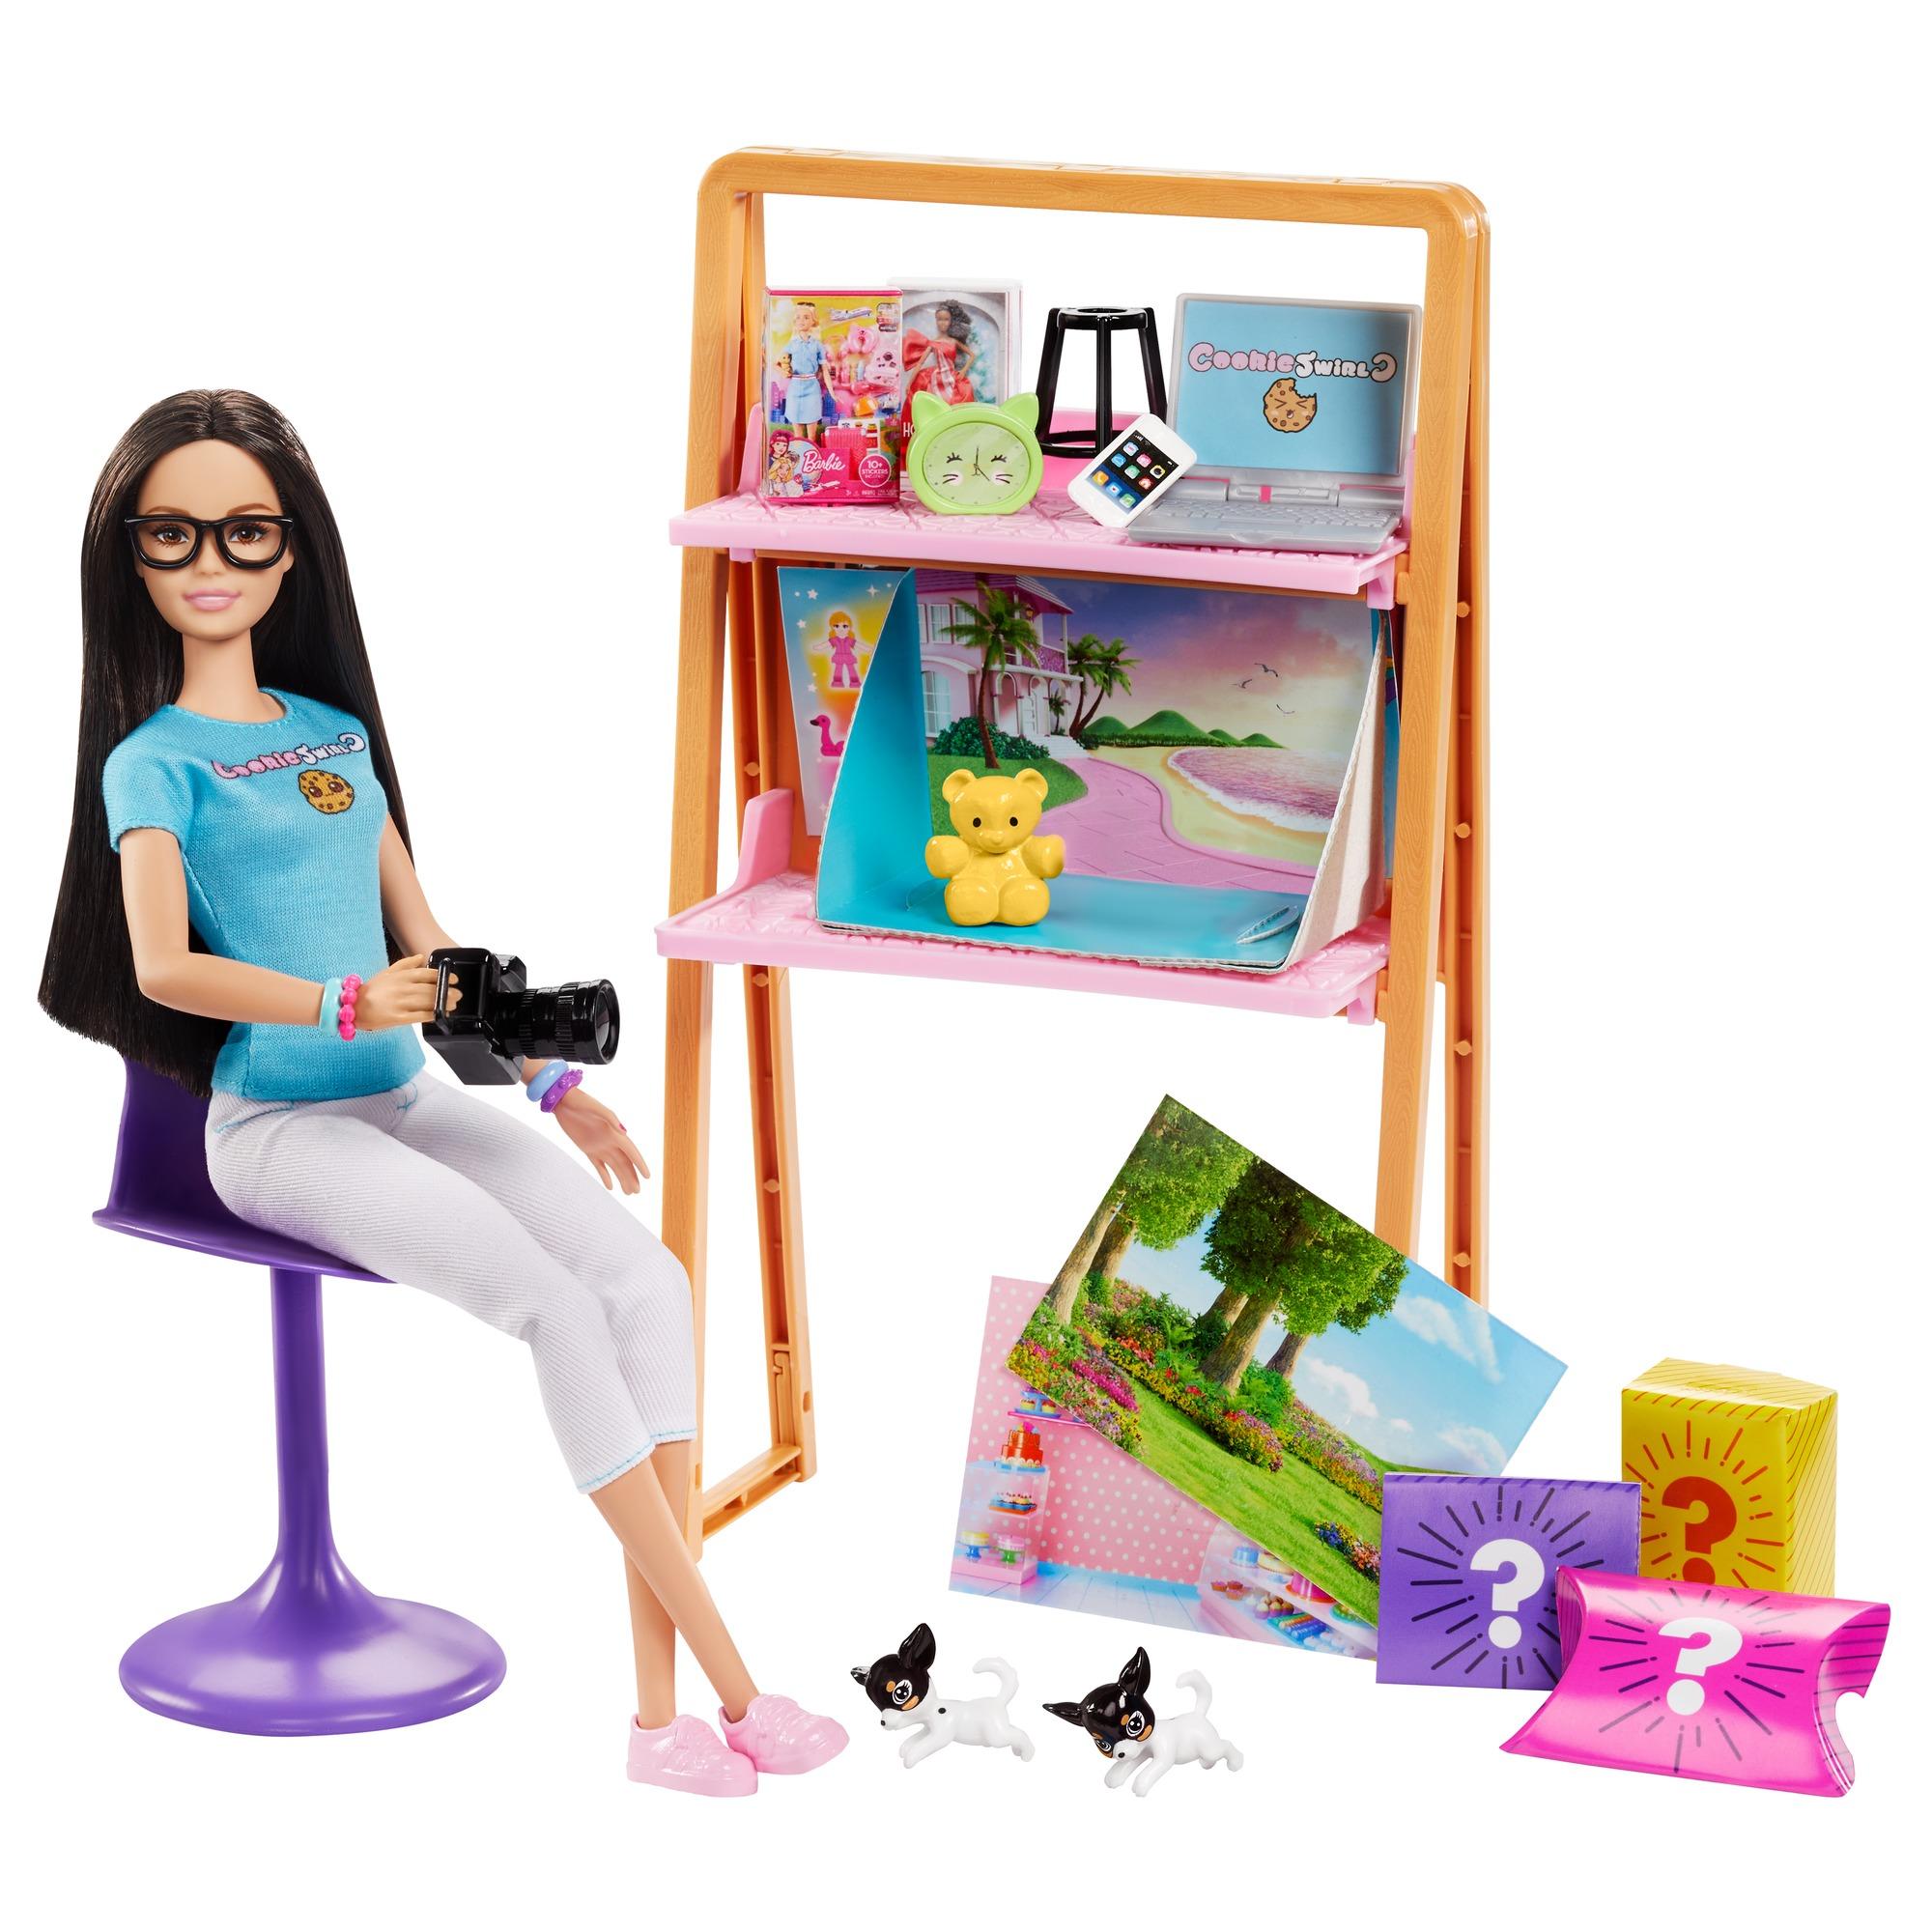 CookieSwirlC Barbie Doll and A...